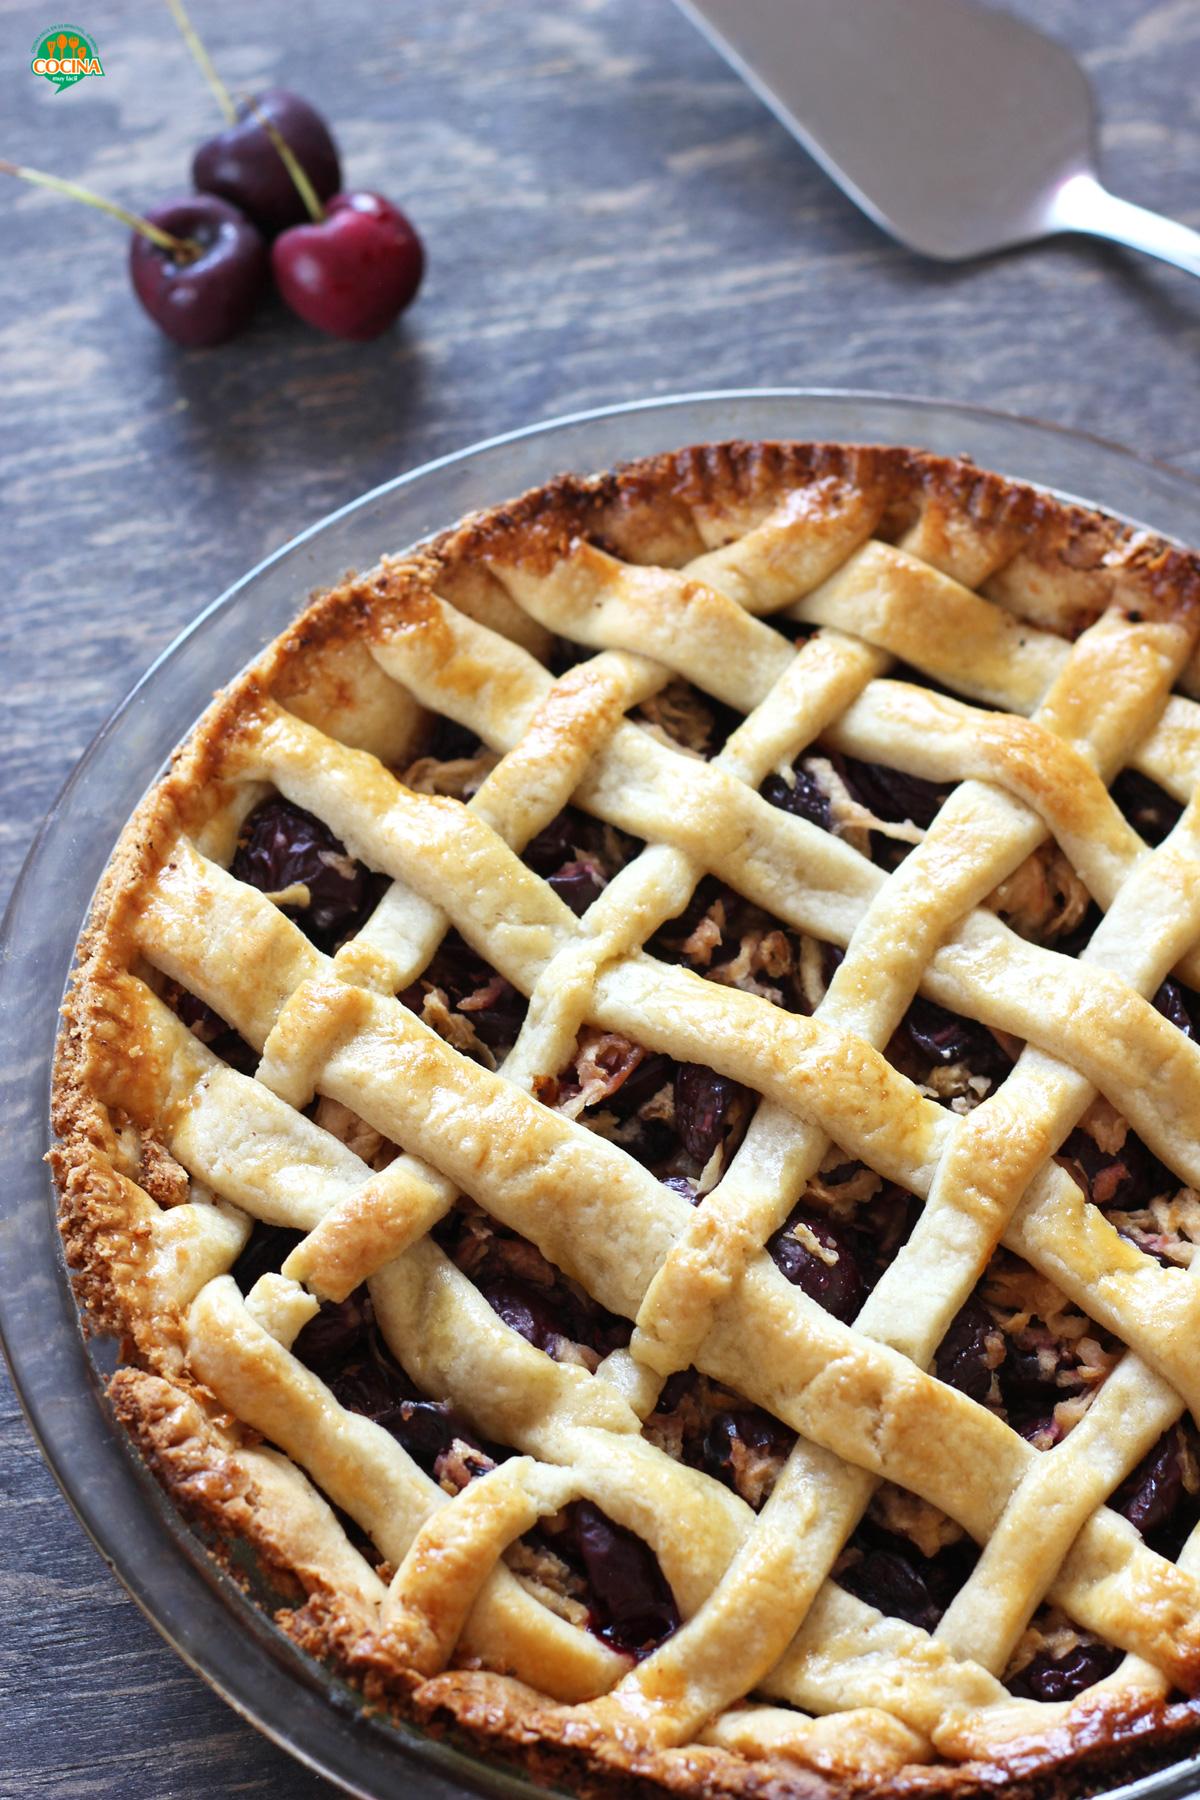 Tarta de cerezas o Cherry Pie. Receta | cocinamuyfacil.com